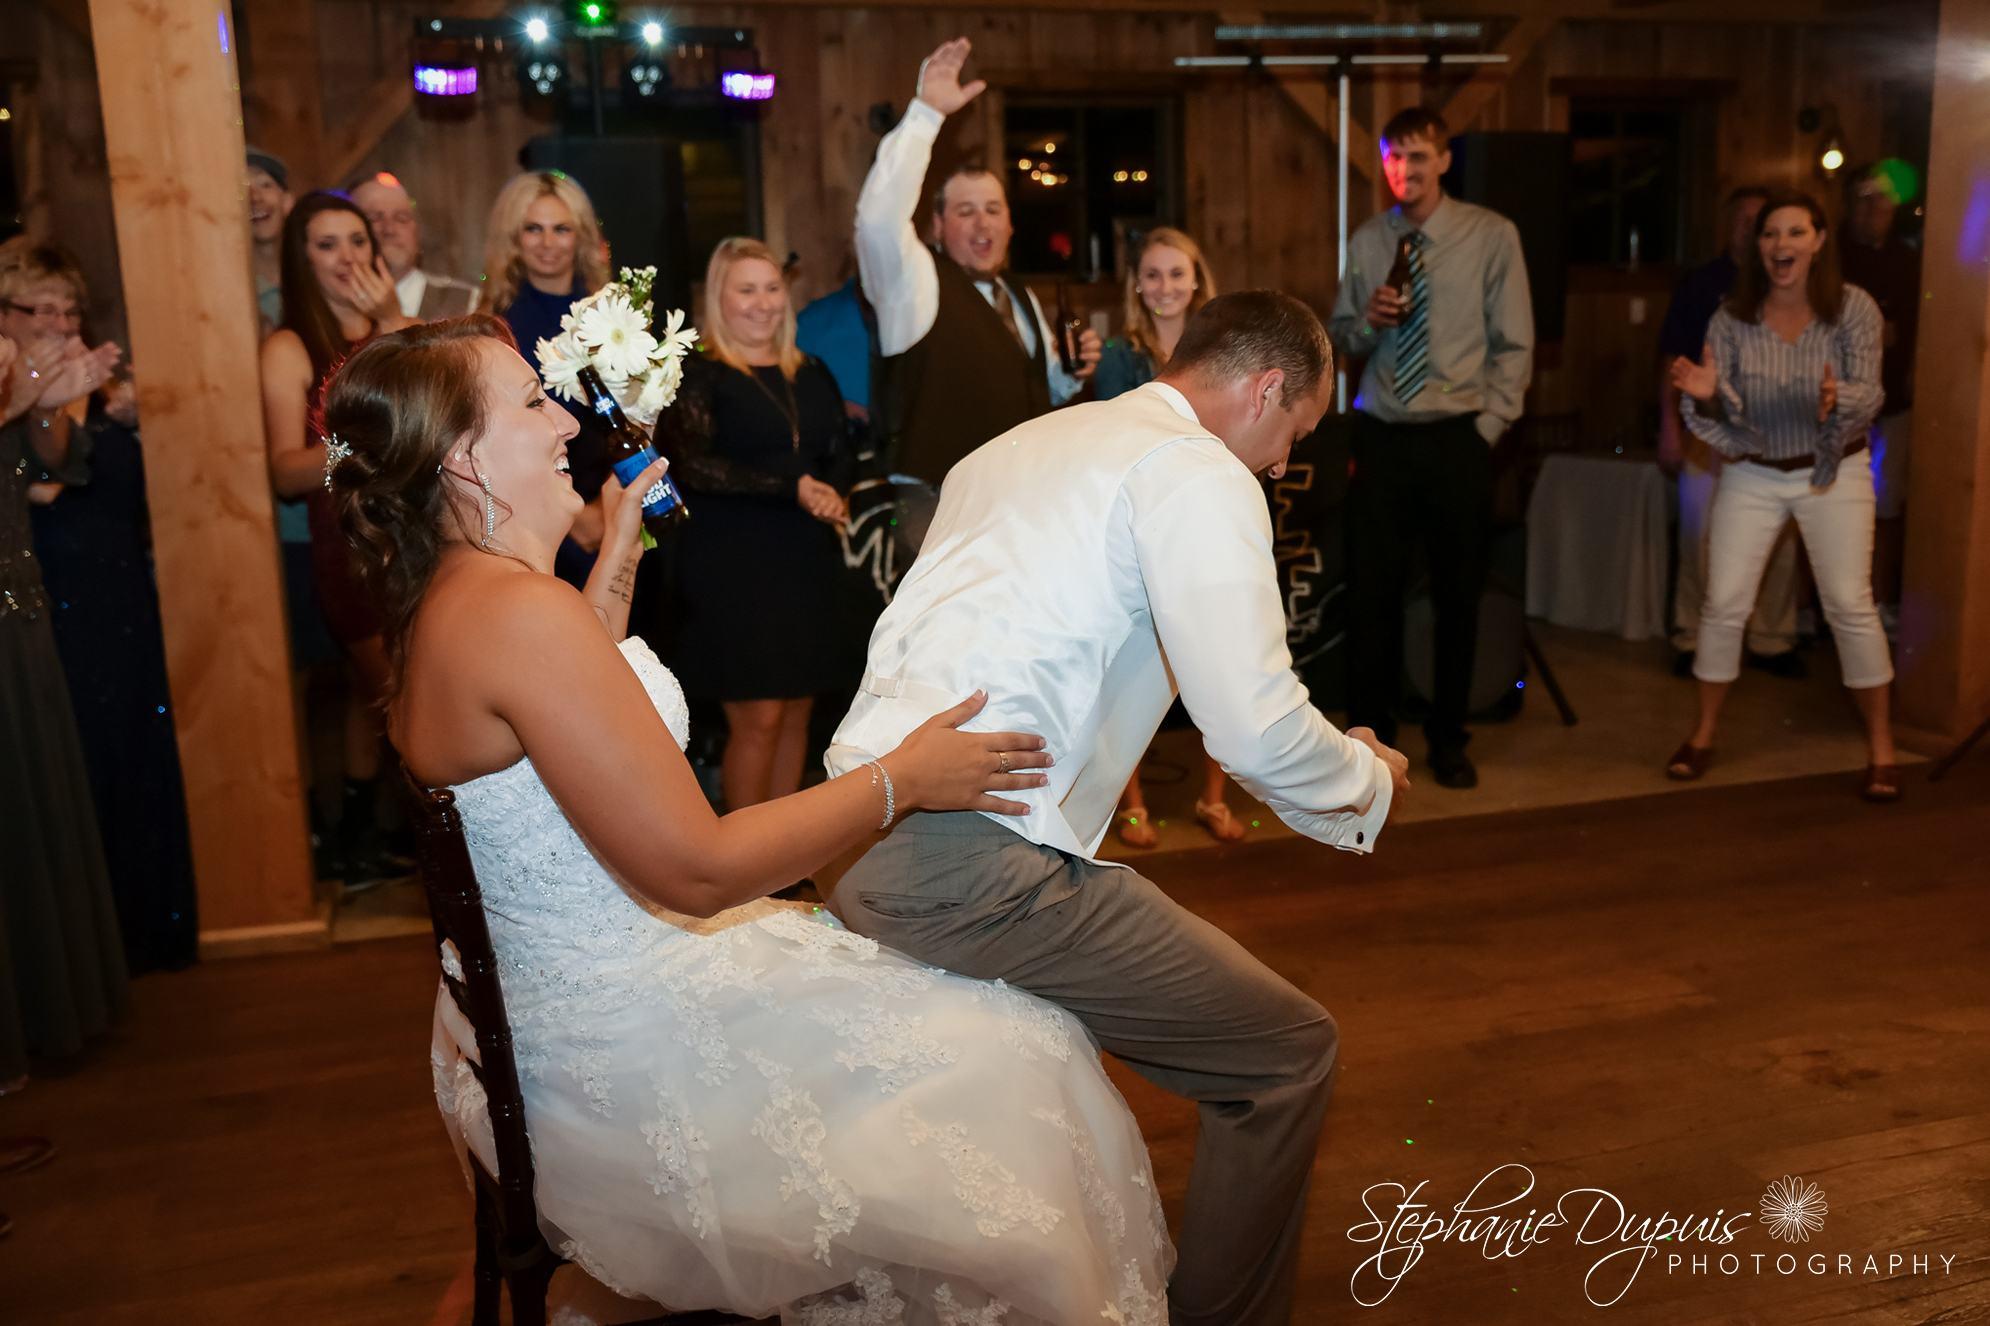 Whitefield Wedding Photographer 04 4 - Portfolio: Nason Wedding